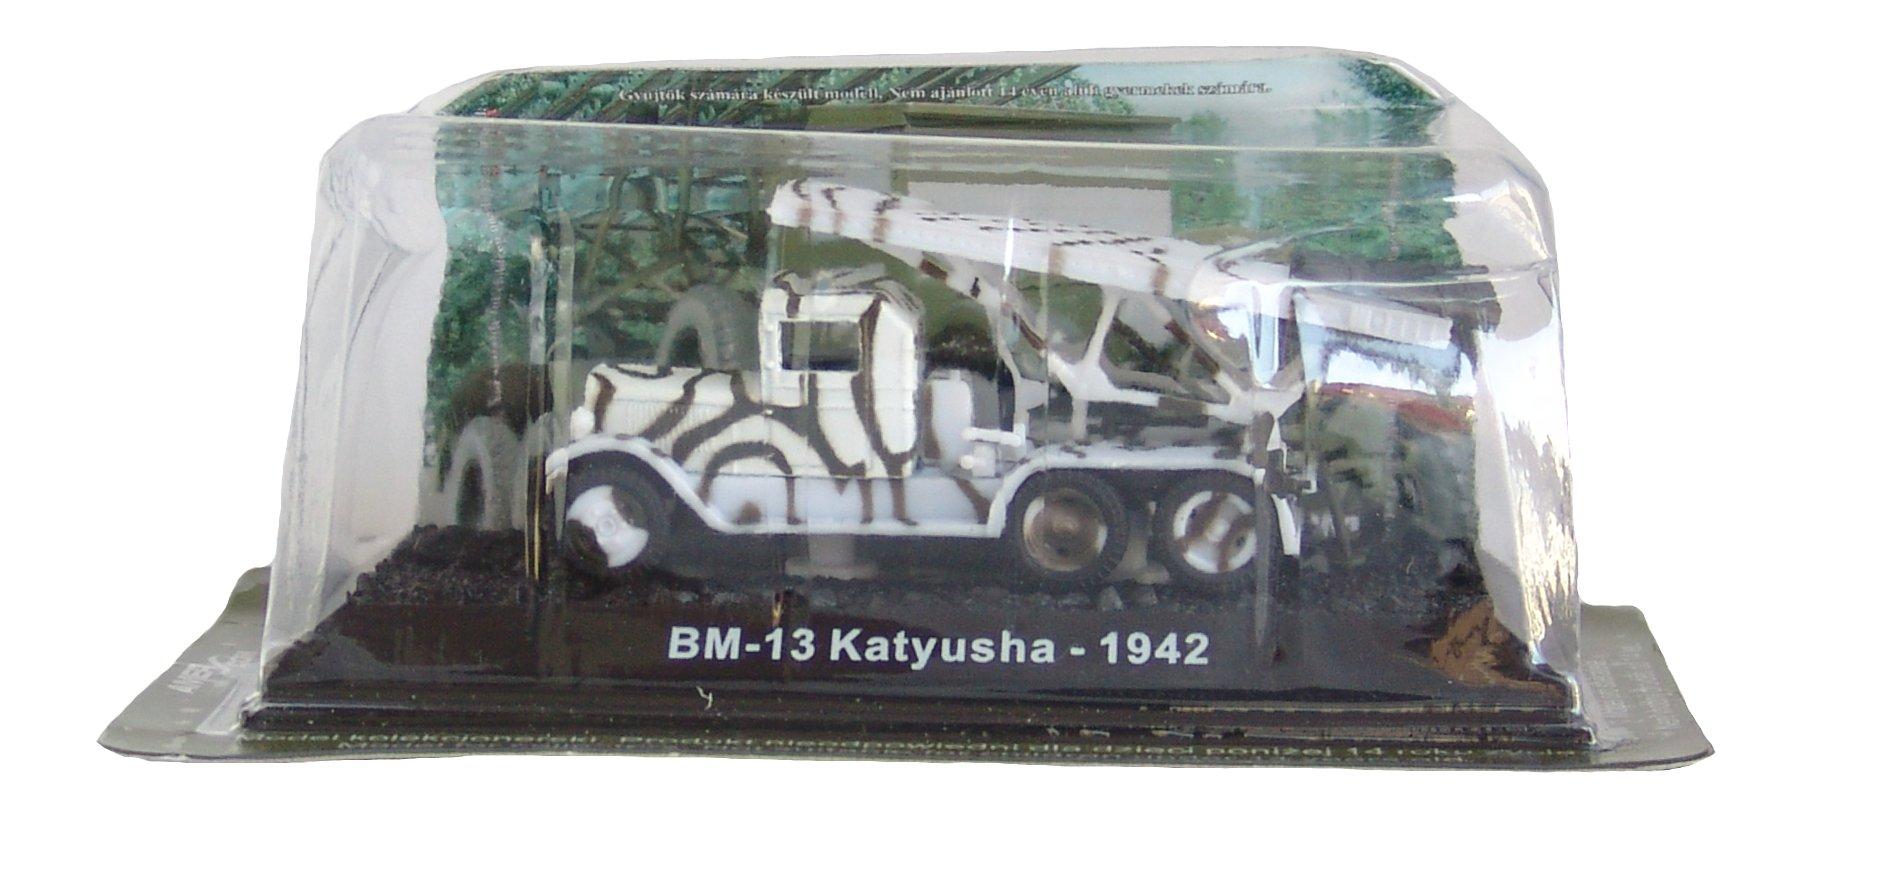 BM-13 Katyusha - 1942 diecast 1:72 model (Amercom BG-54)